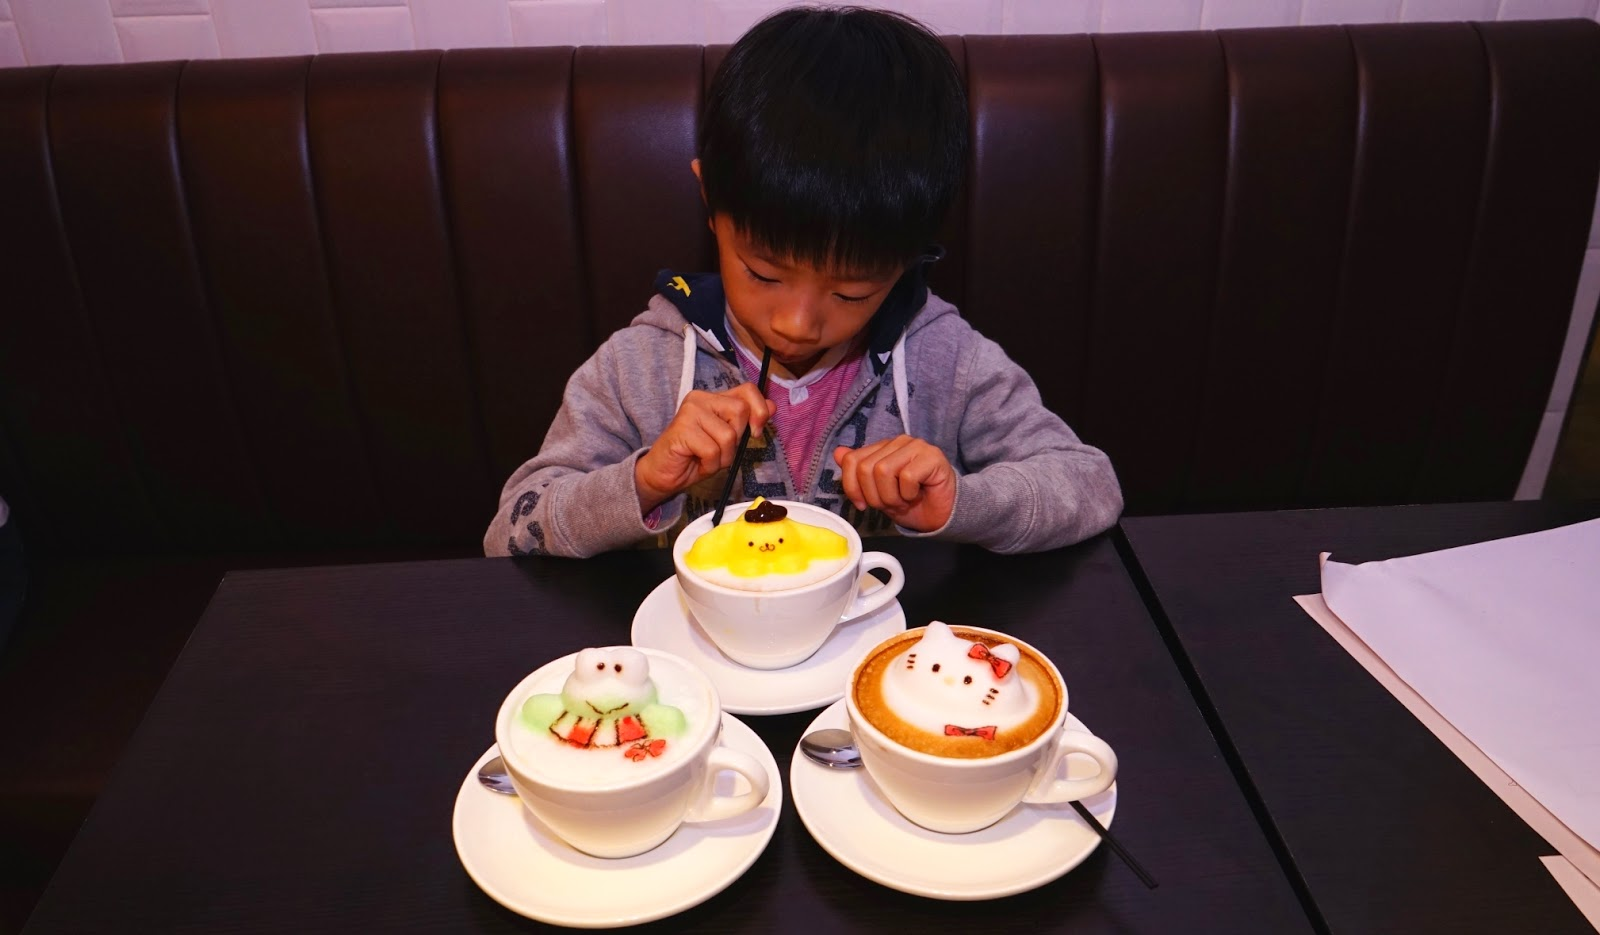 香港 新蒲崗 Mikiki Karena Cafe 3D拉花 咖啡 晚餐 Cappuccino 布甸狗 Hello Kitty Keroppi